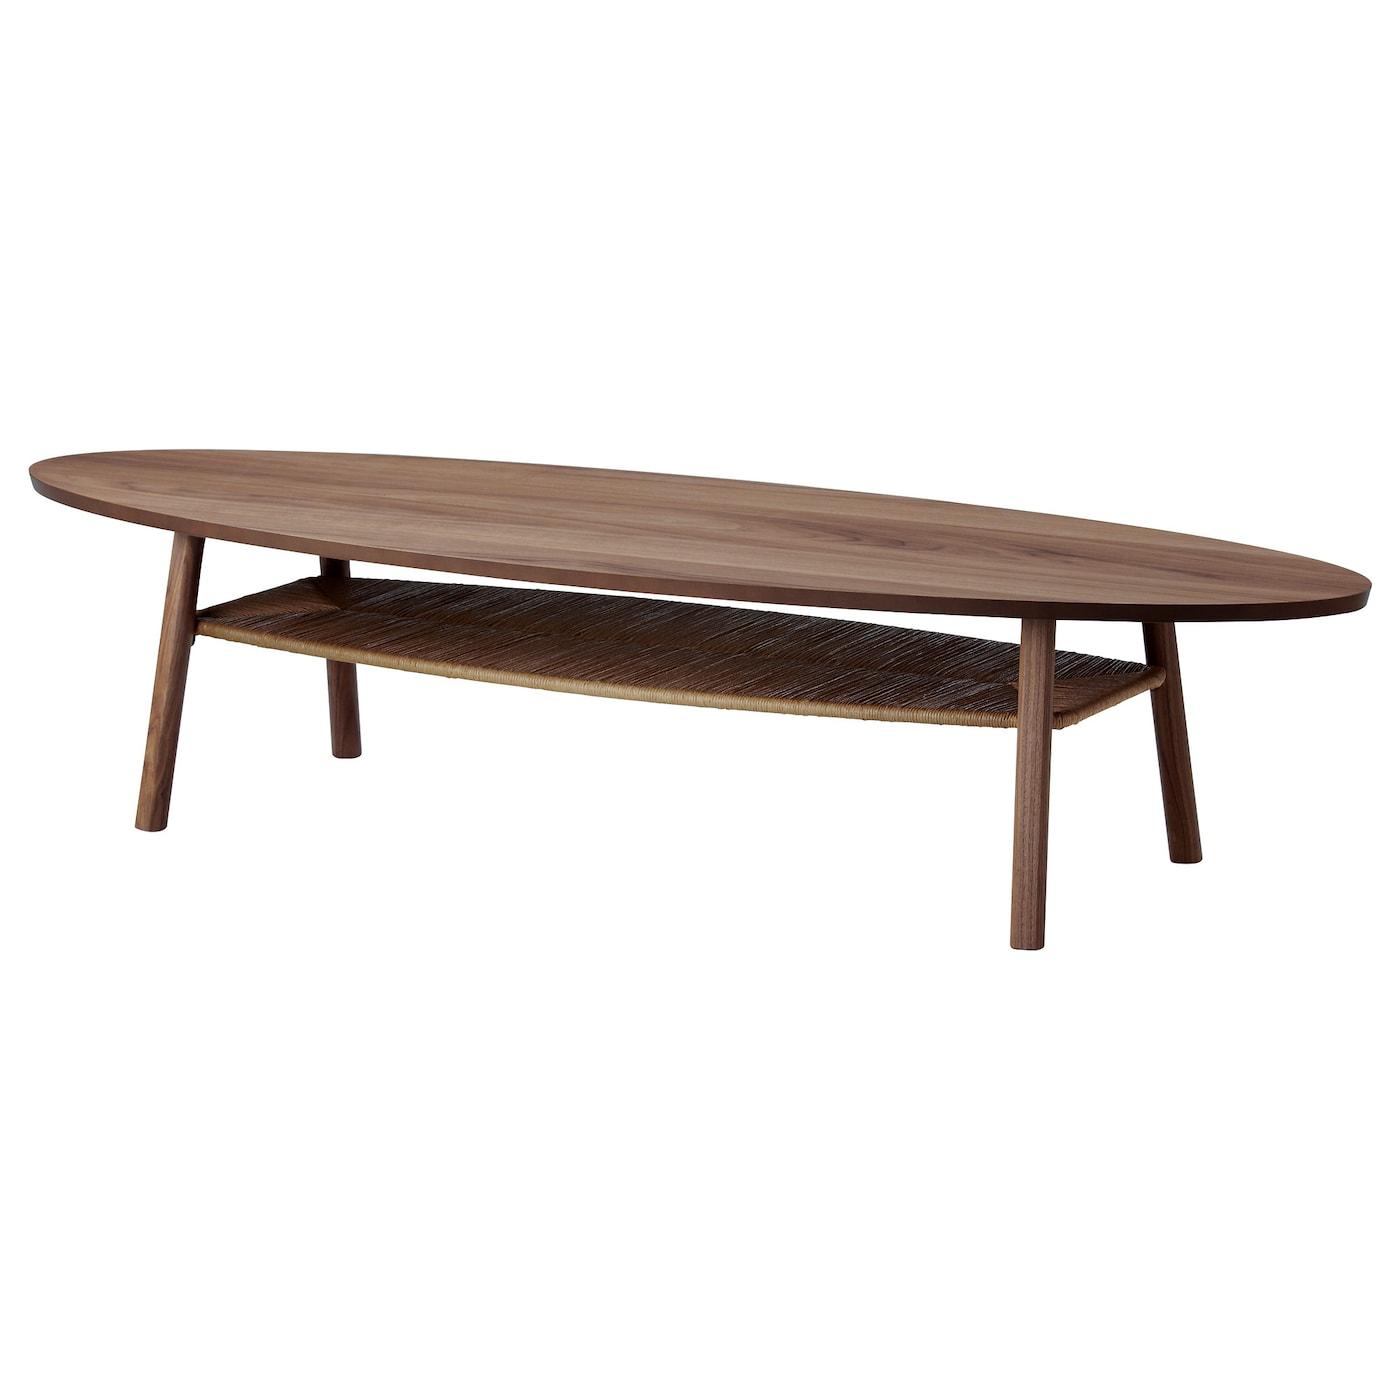 Buy Stockholm Coffee Table 180x59 Cm Online Uae Ikea [ 1400 x 1400 Pixel ]